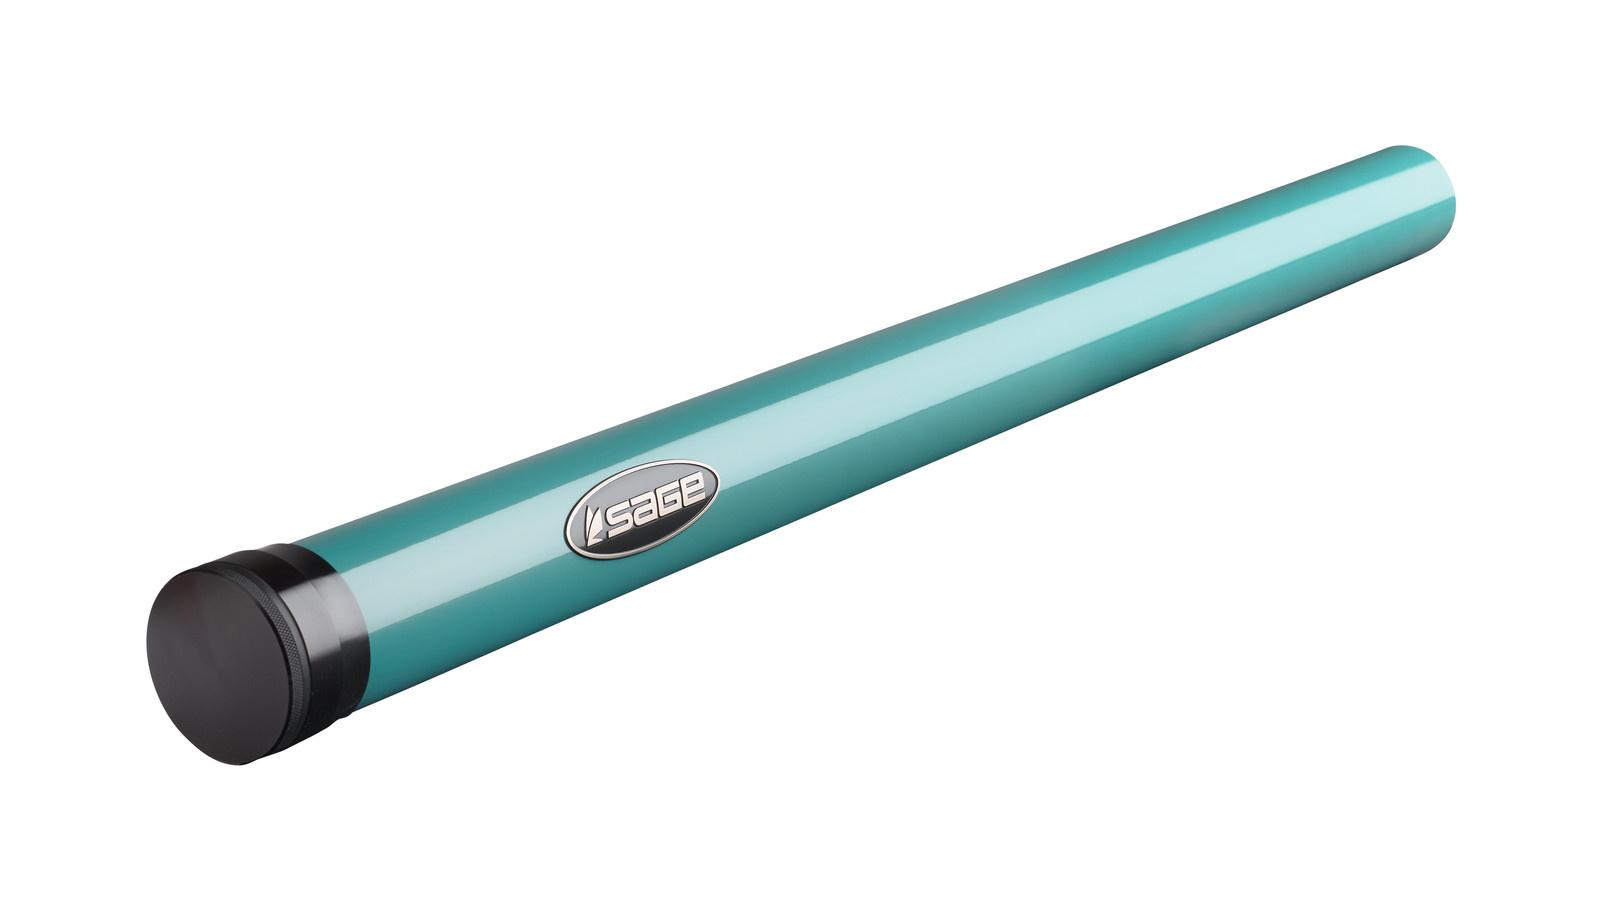 Sage Sage X Rod - Limited Edition